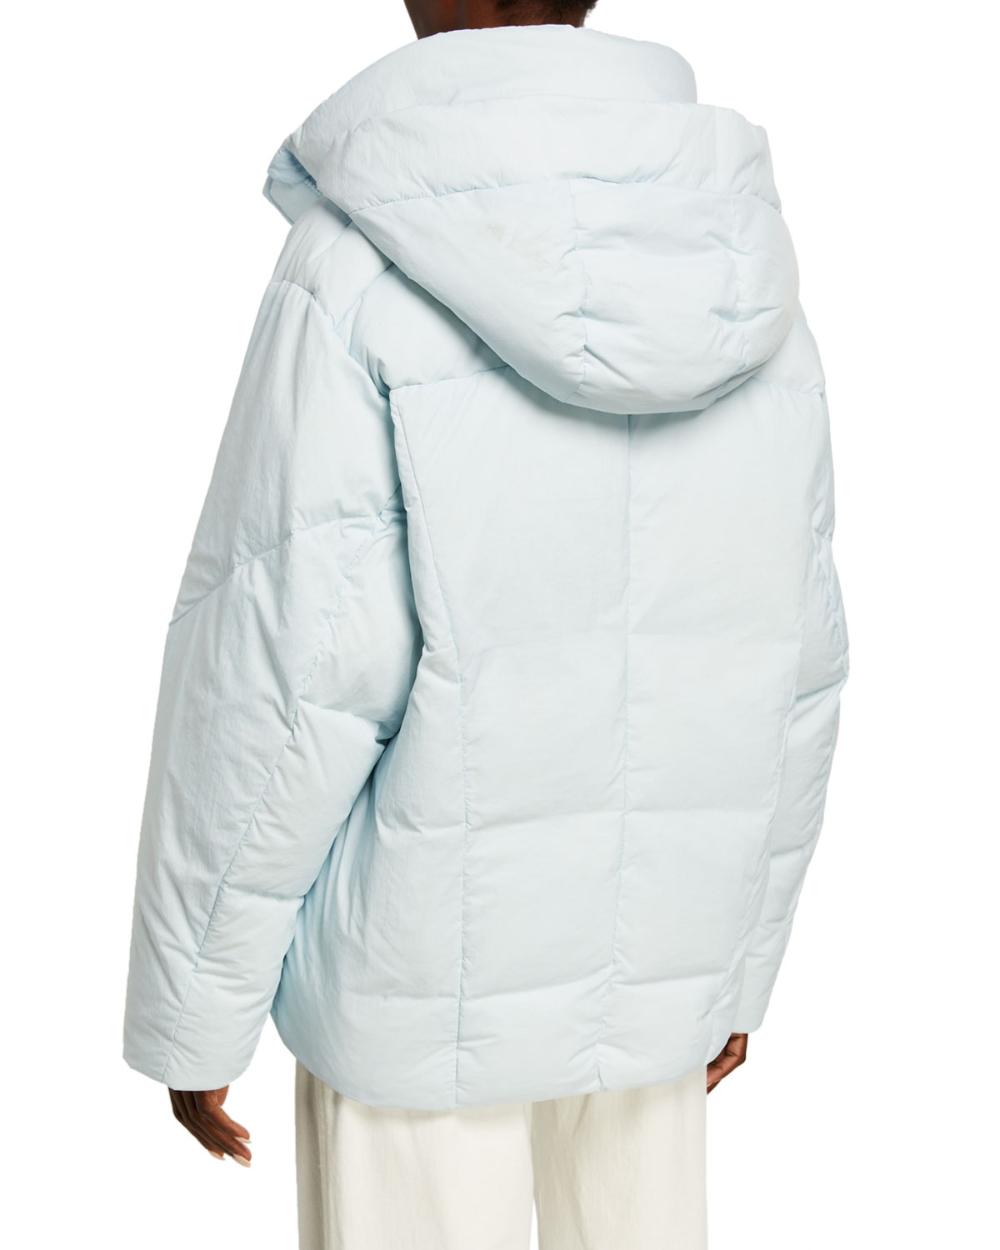 Vince Hooded Zip Front Puffer Jacket Puffer Jackets Jackets Tops Designs [ 1250 x 1000 Pixel ]